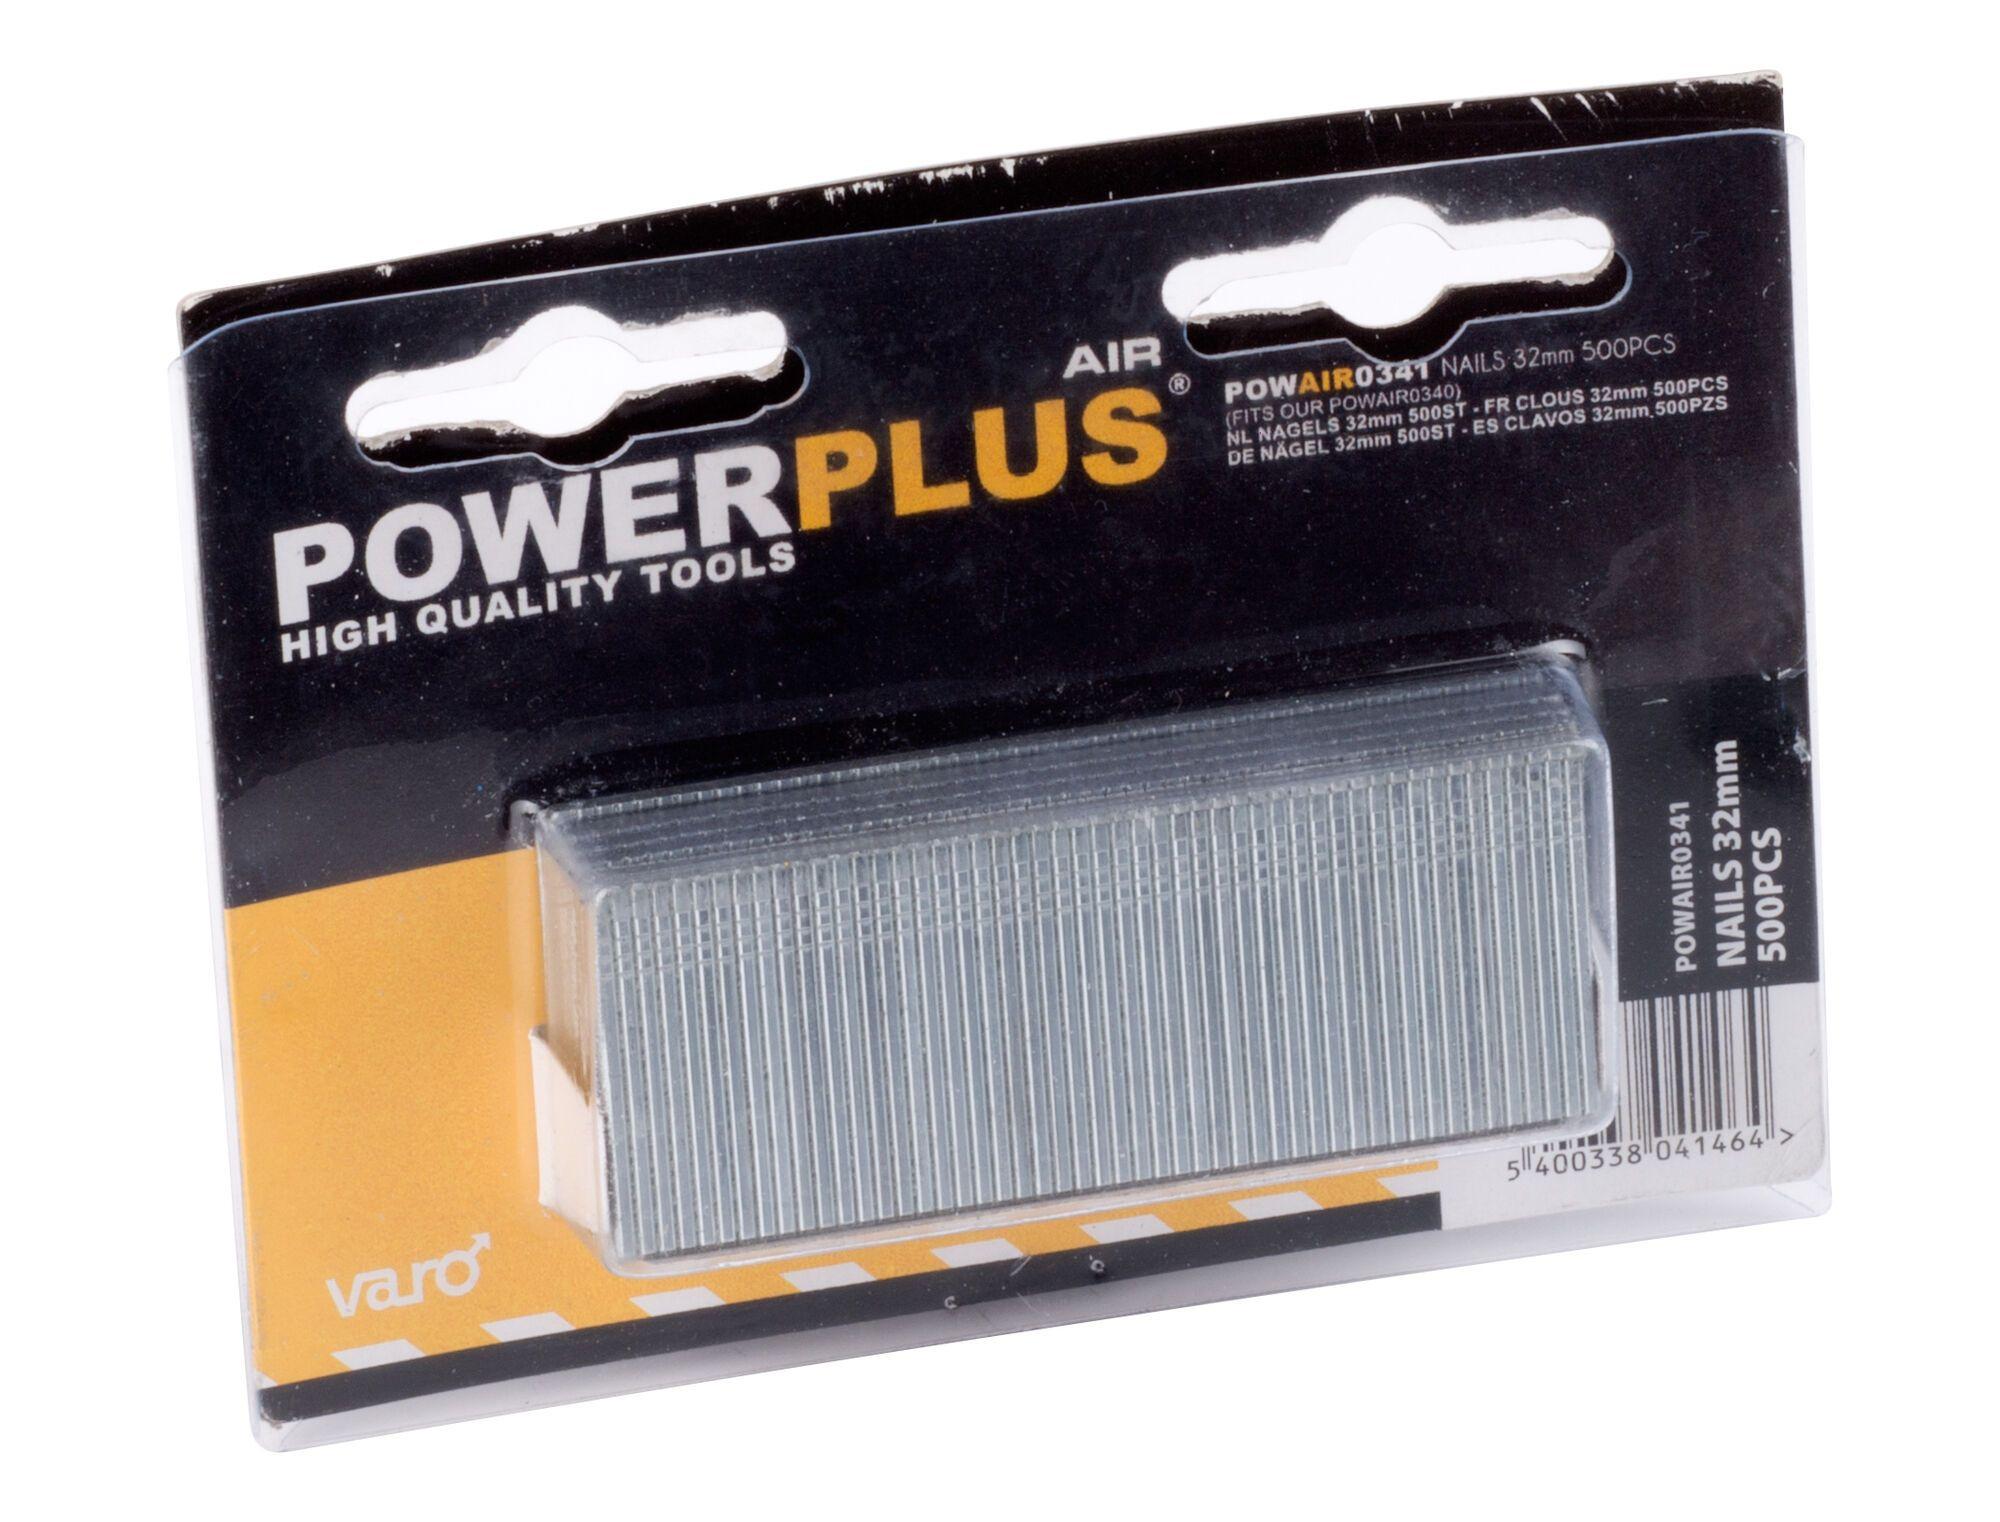 Powerplus POWAIR0341 500 Spijkers 32 mm | Stalen nagels voor nagelapparaat